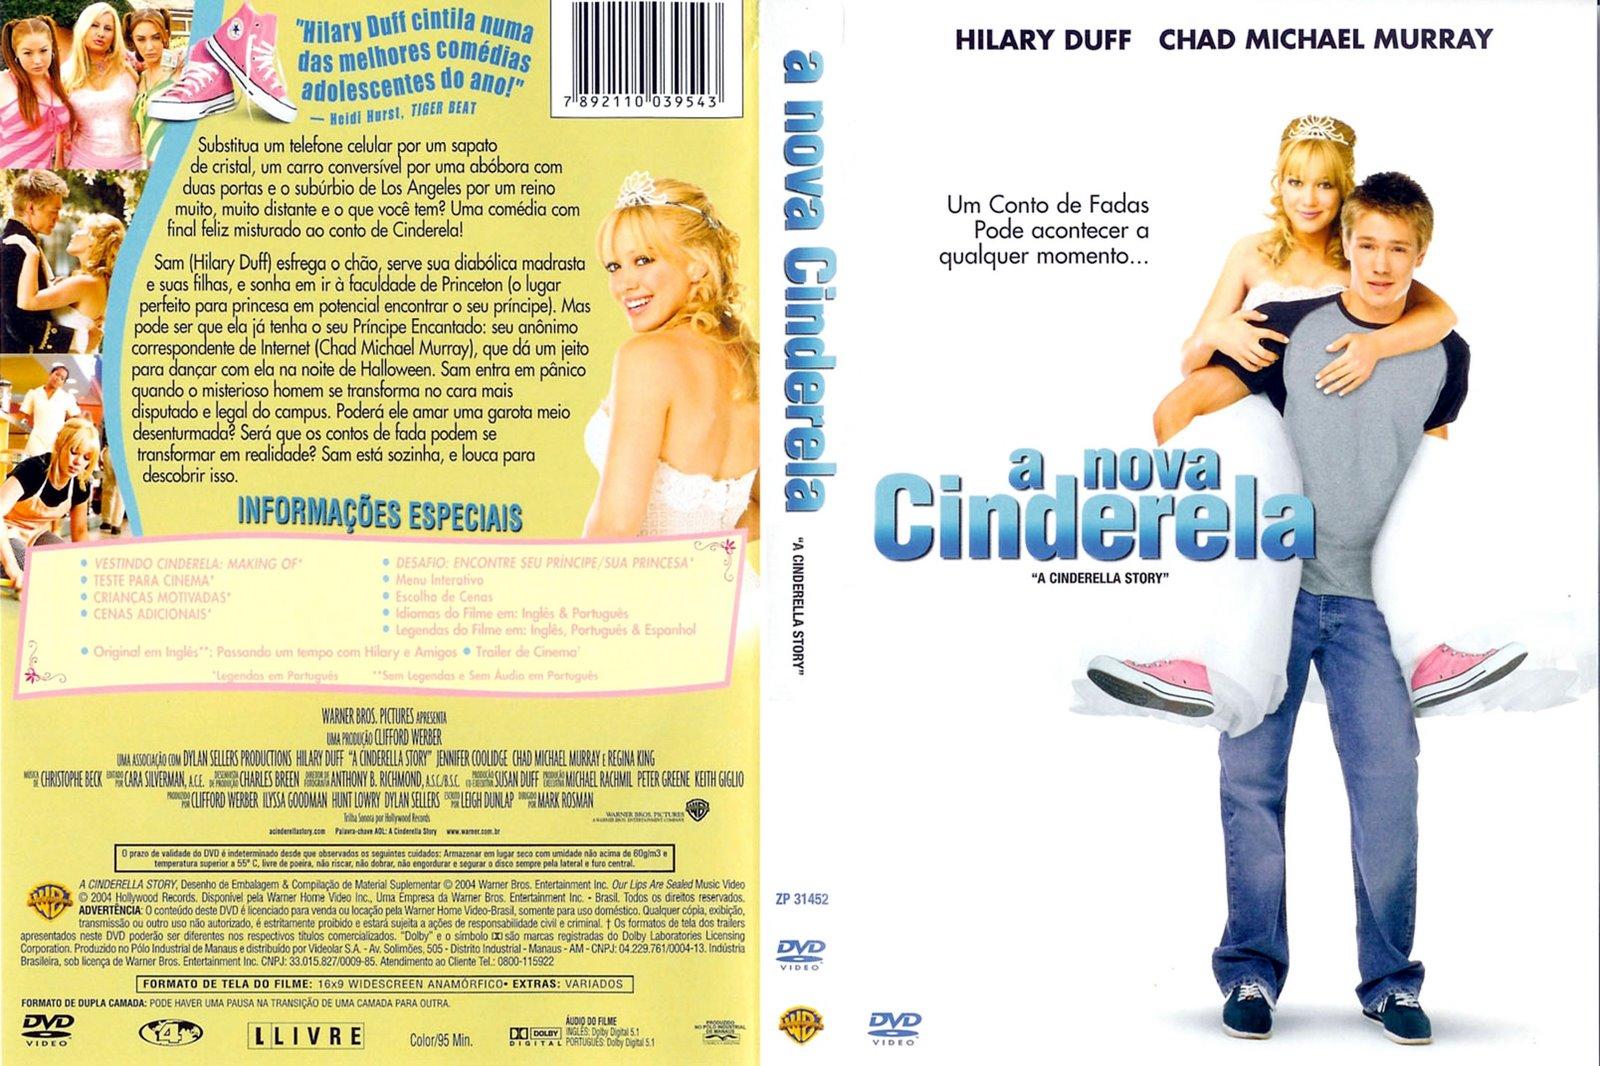 http://4.bp.blogspot.com/_avx0CDv74_c/TCo7TlUZwhI/AAAAAAAAABM/2O5kHT8LxZ0/s1600/A_Nova_Cinderela.jpg